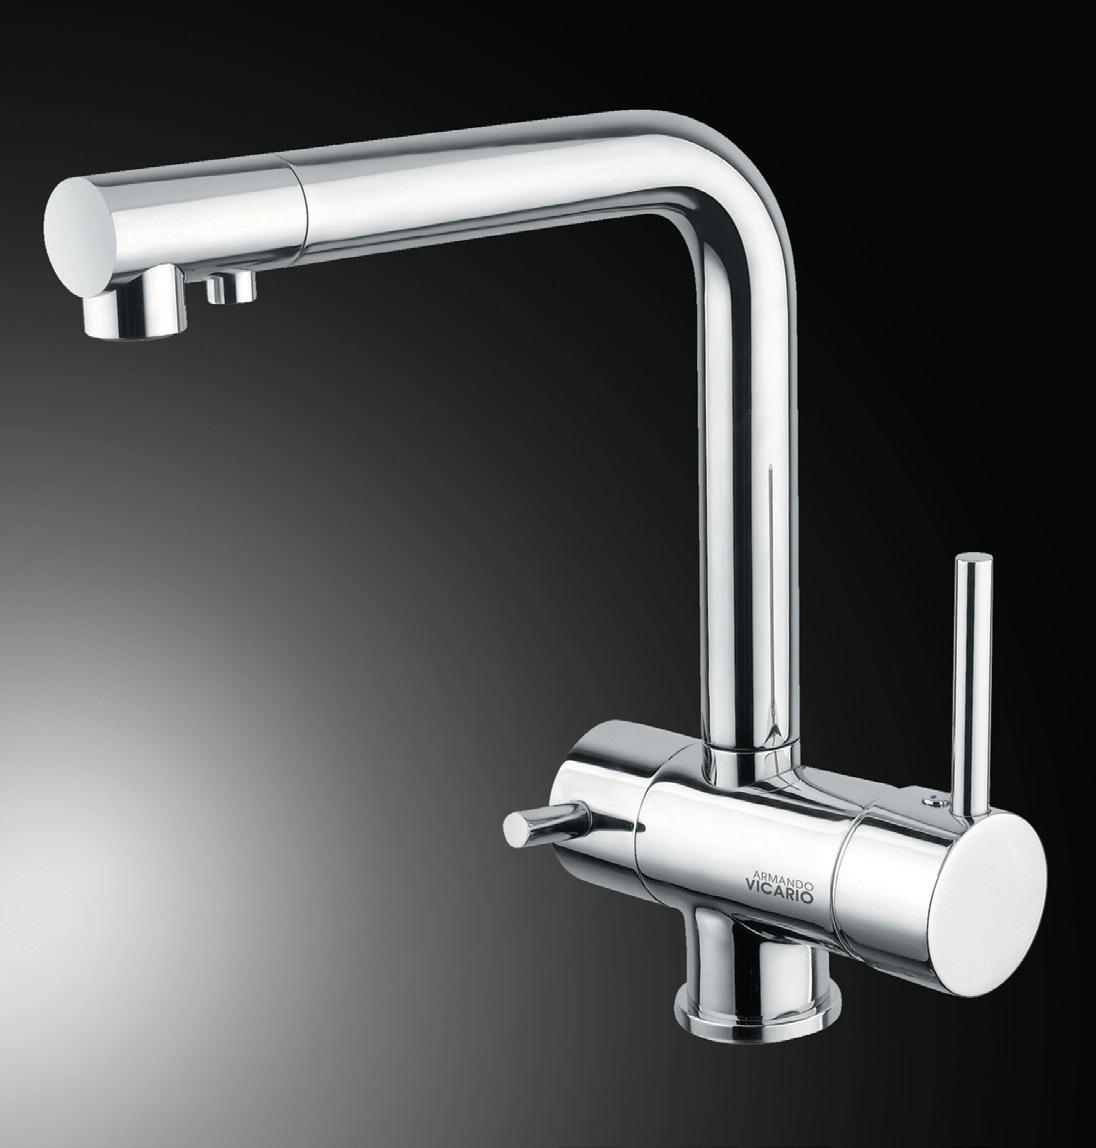 tap faucets en water detail und seite design kitchen product soda kwc faucet werksdesign armatur